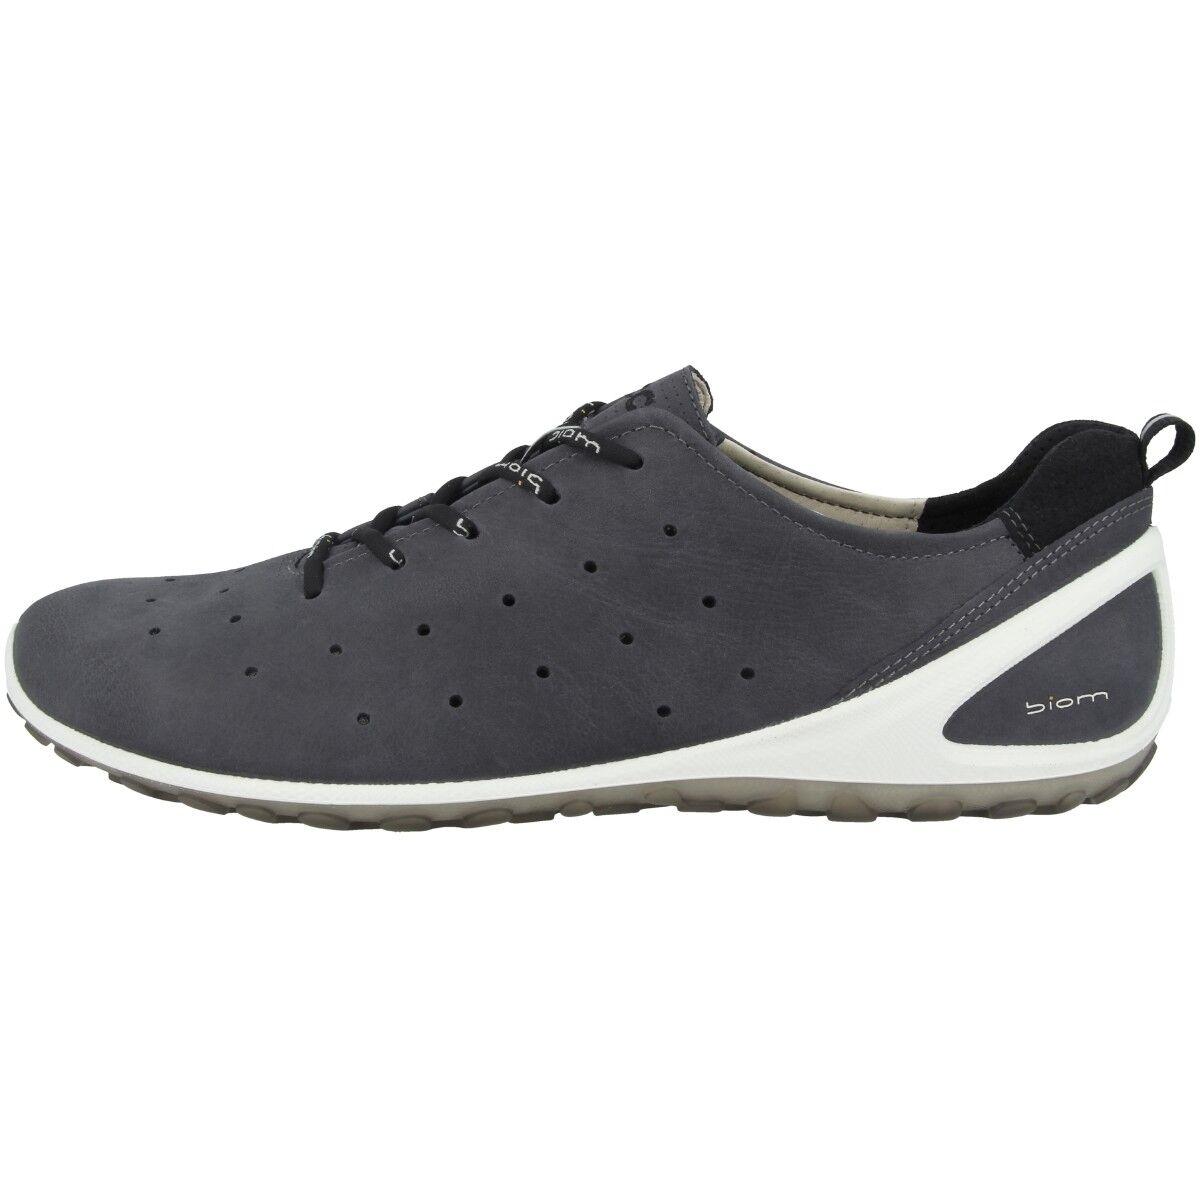 Ecco Biom Lite 1.2 Schuhe Natural 802004-54780 Motion Herren Sneaker ombre 802004-54780 Natural 623f00